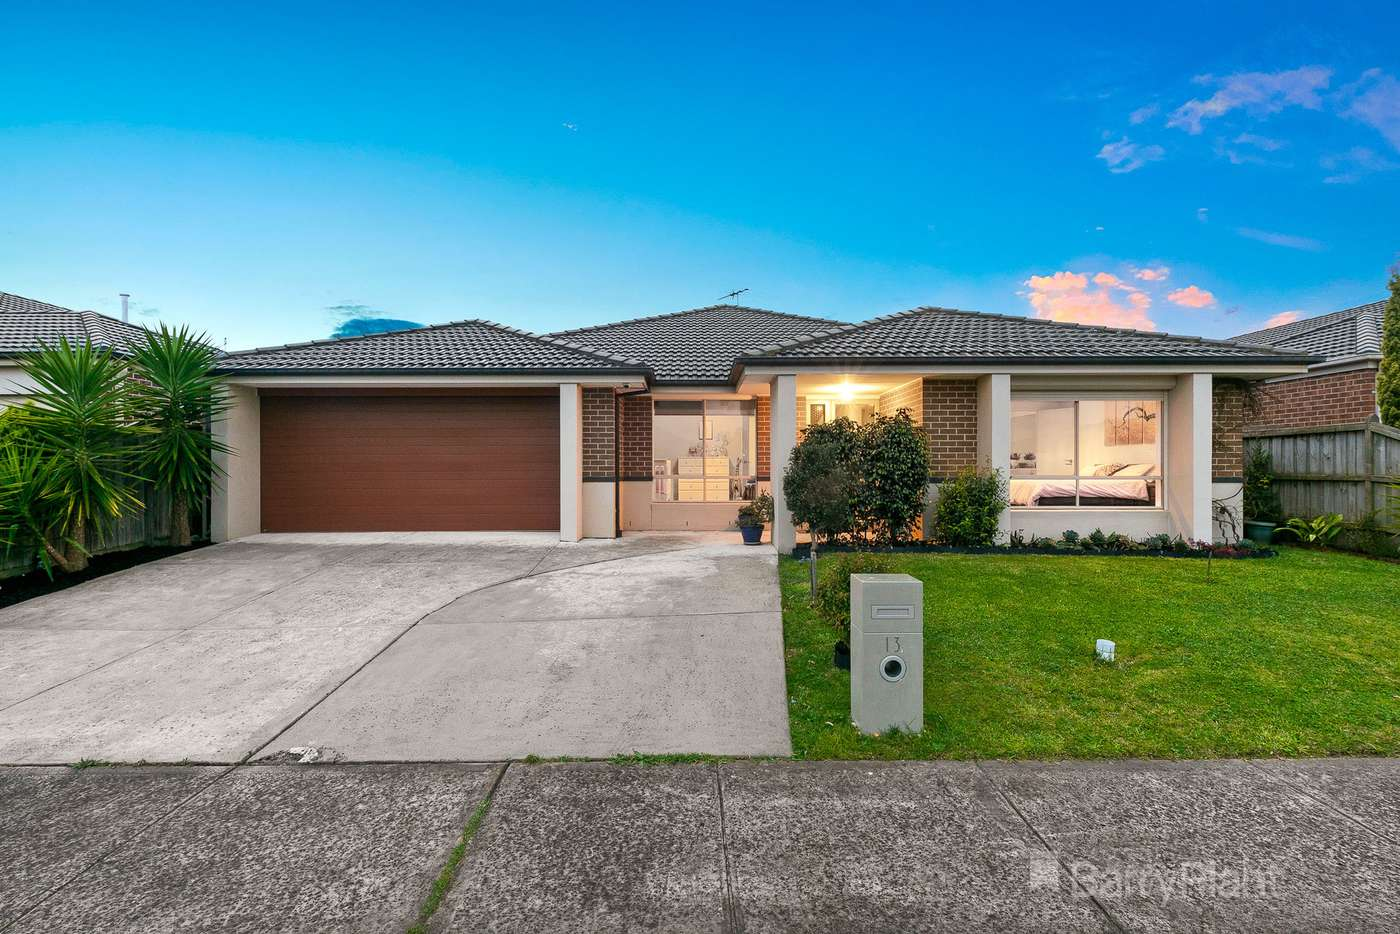 Main view of Homely house listing, 13 Vanessa Circuit, Pakenham VIC 3810